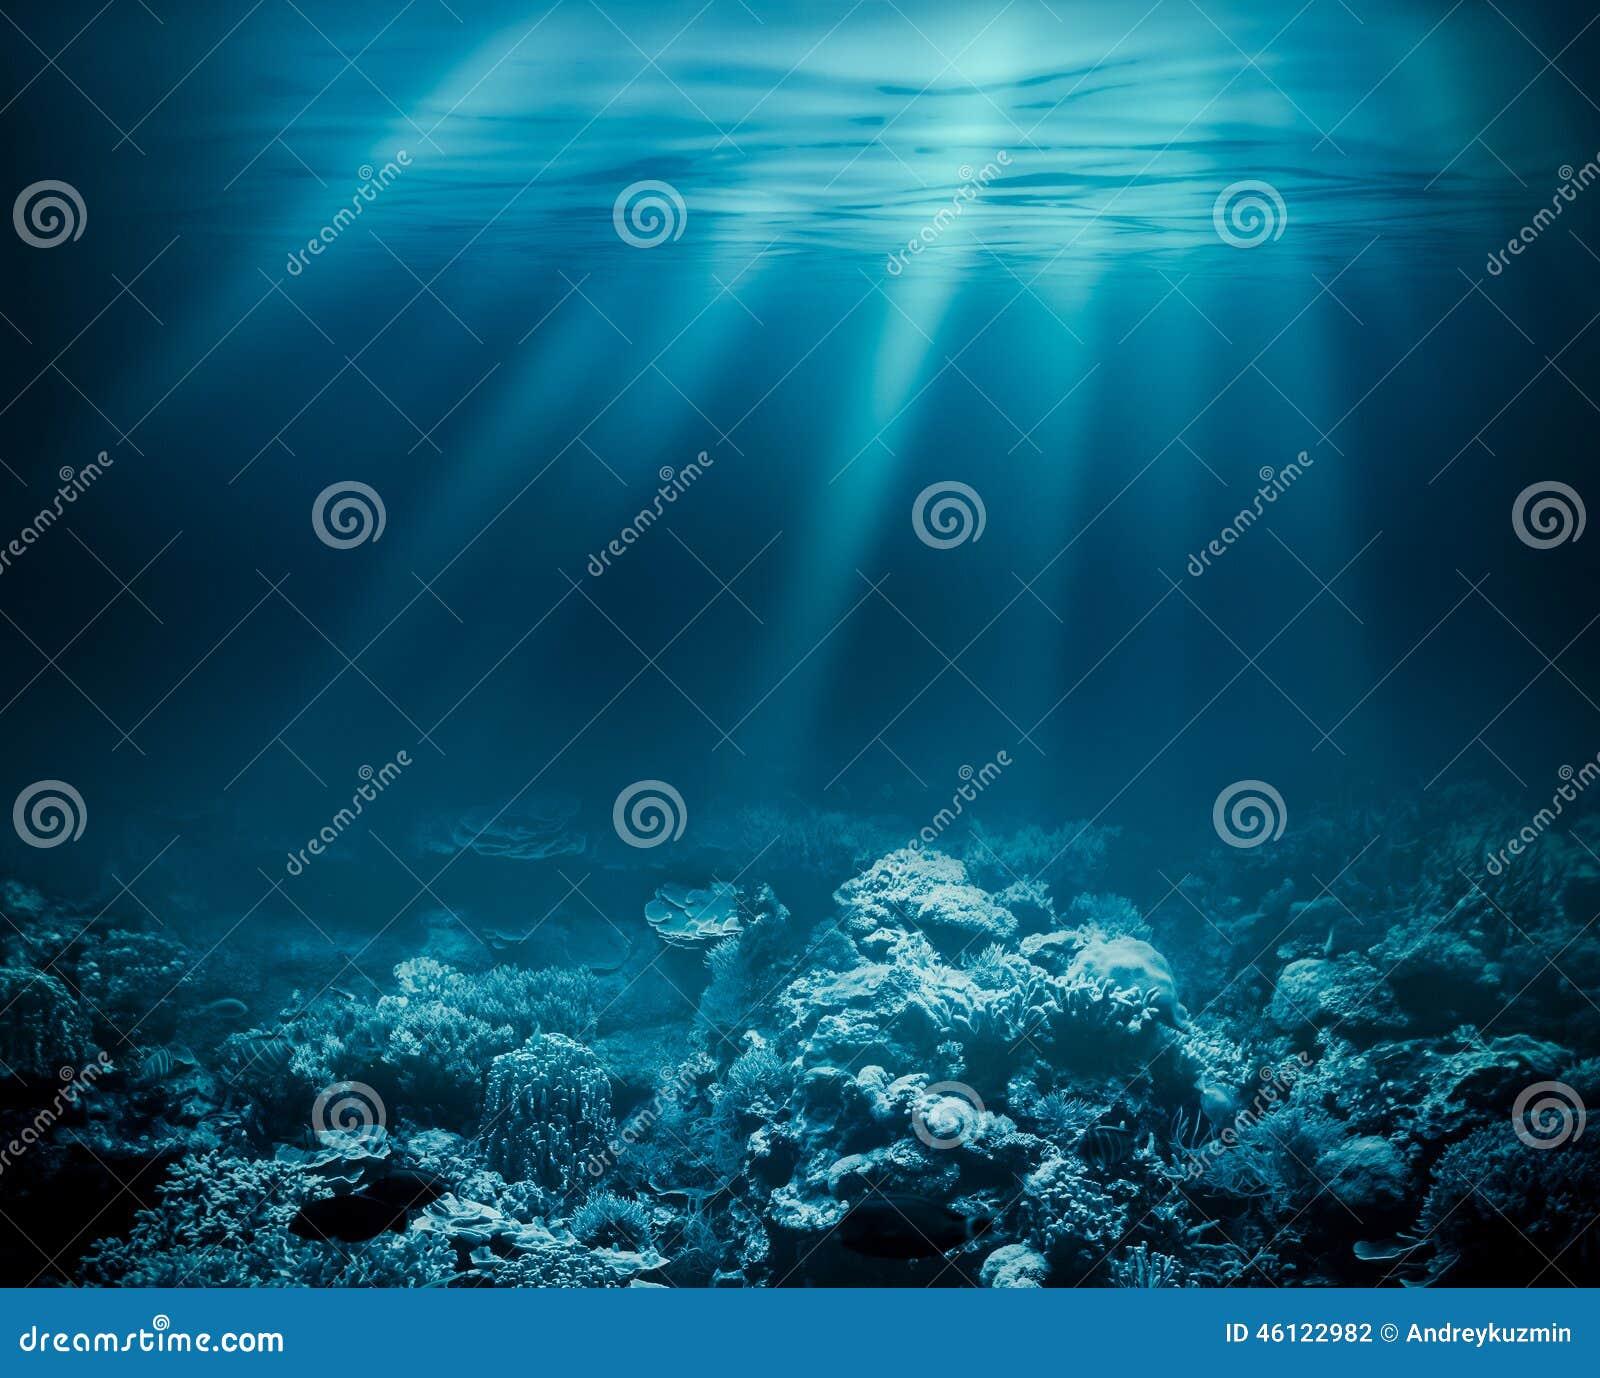 Sea deep or ocean underwater with coral reef as a